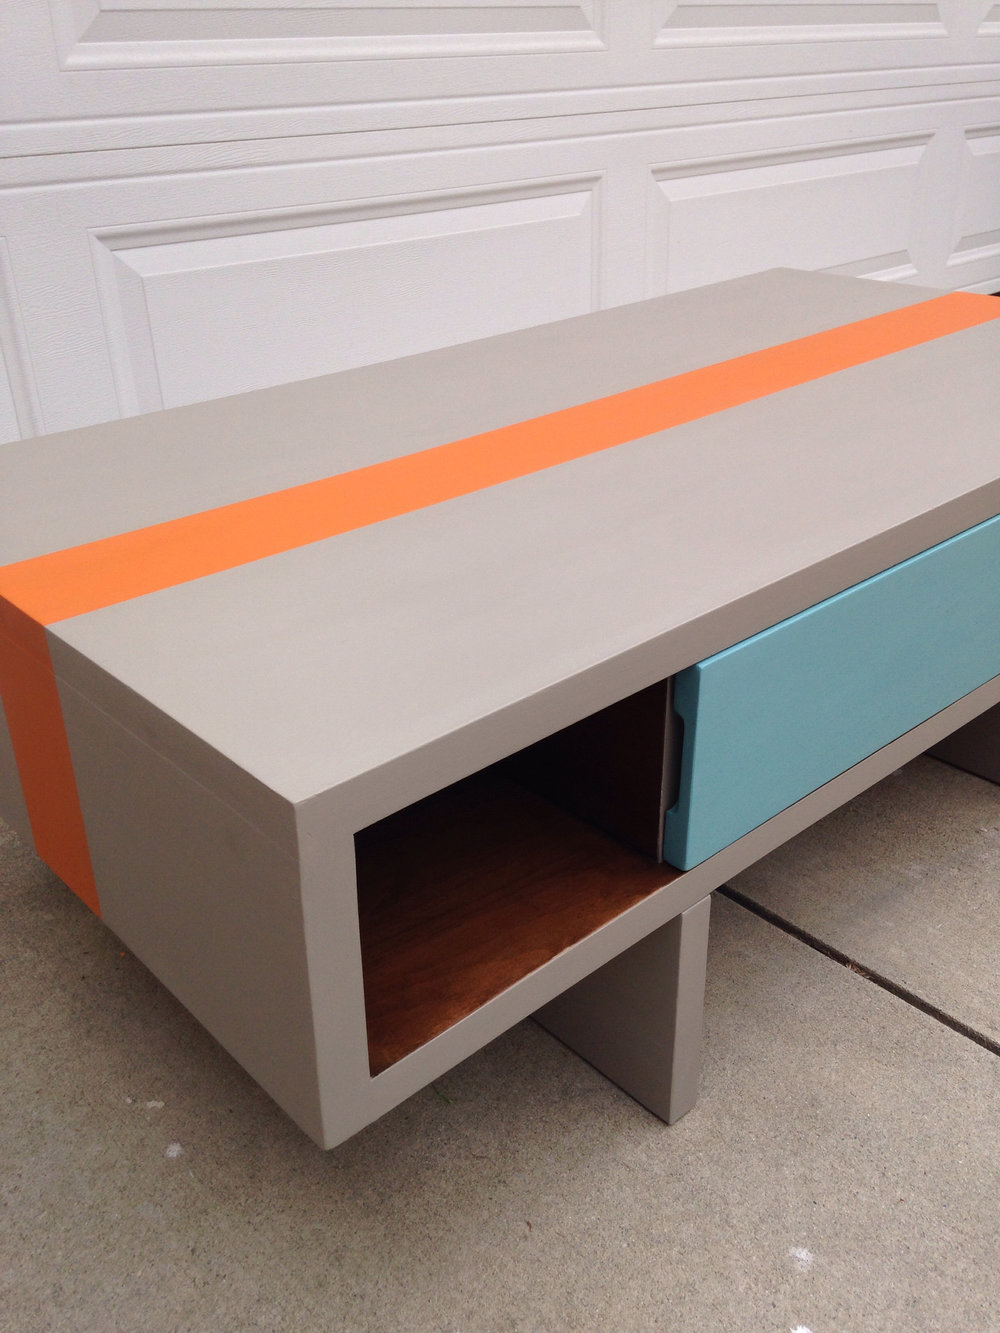 crimson + oak designs |  retro mod coffee table 004.JPG